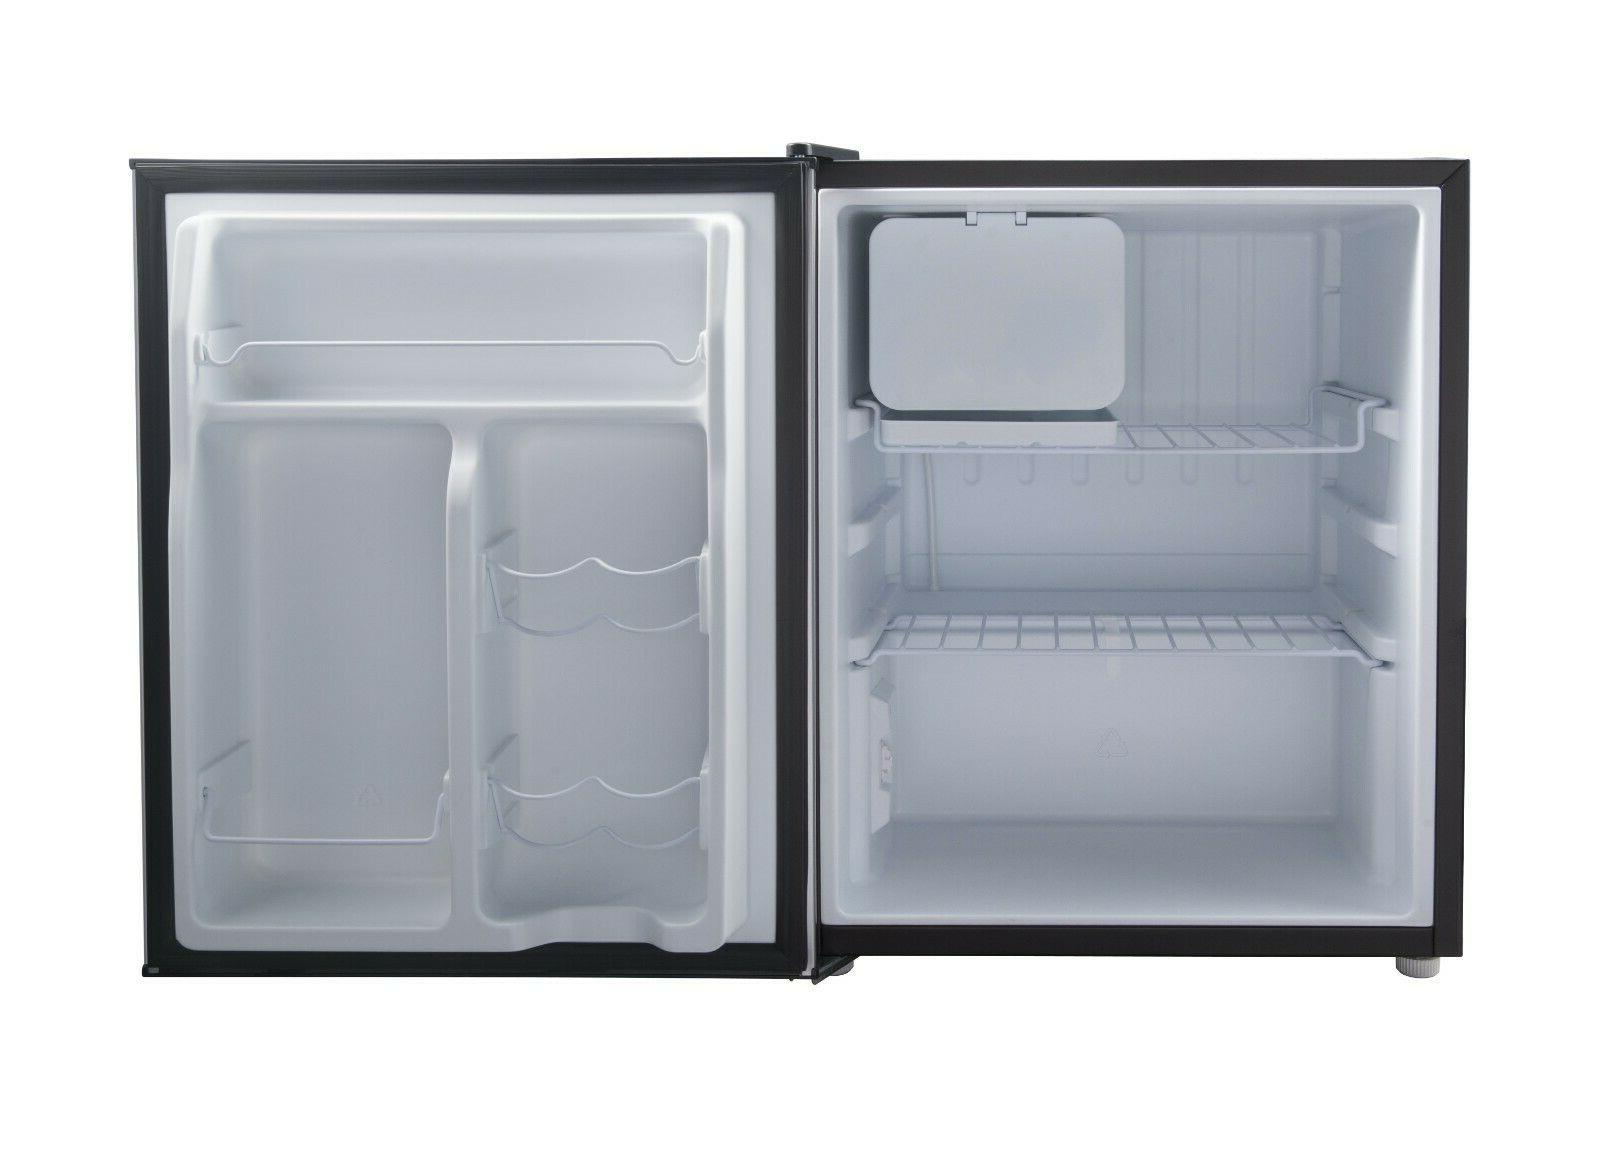 Galanz 2.7 Cu Single Door Fridge Freezer Small Steel